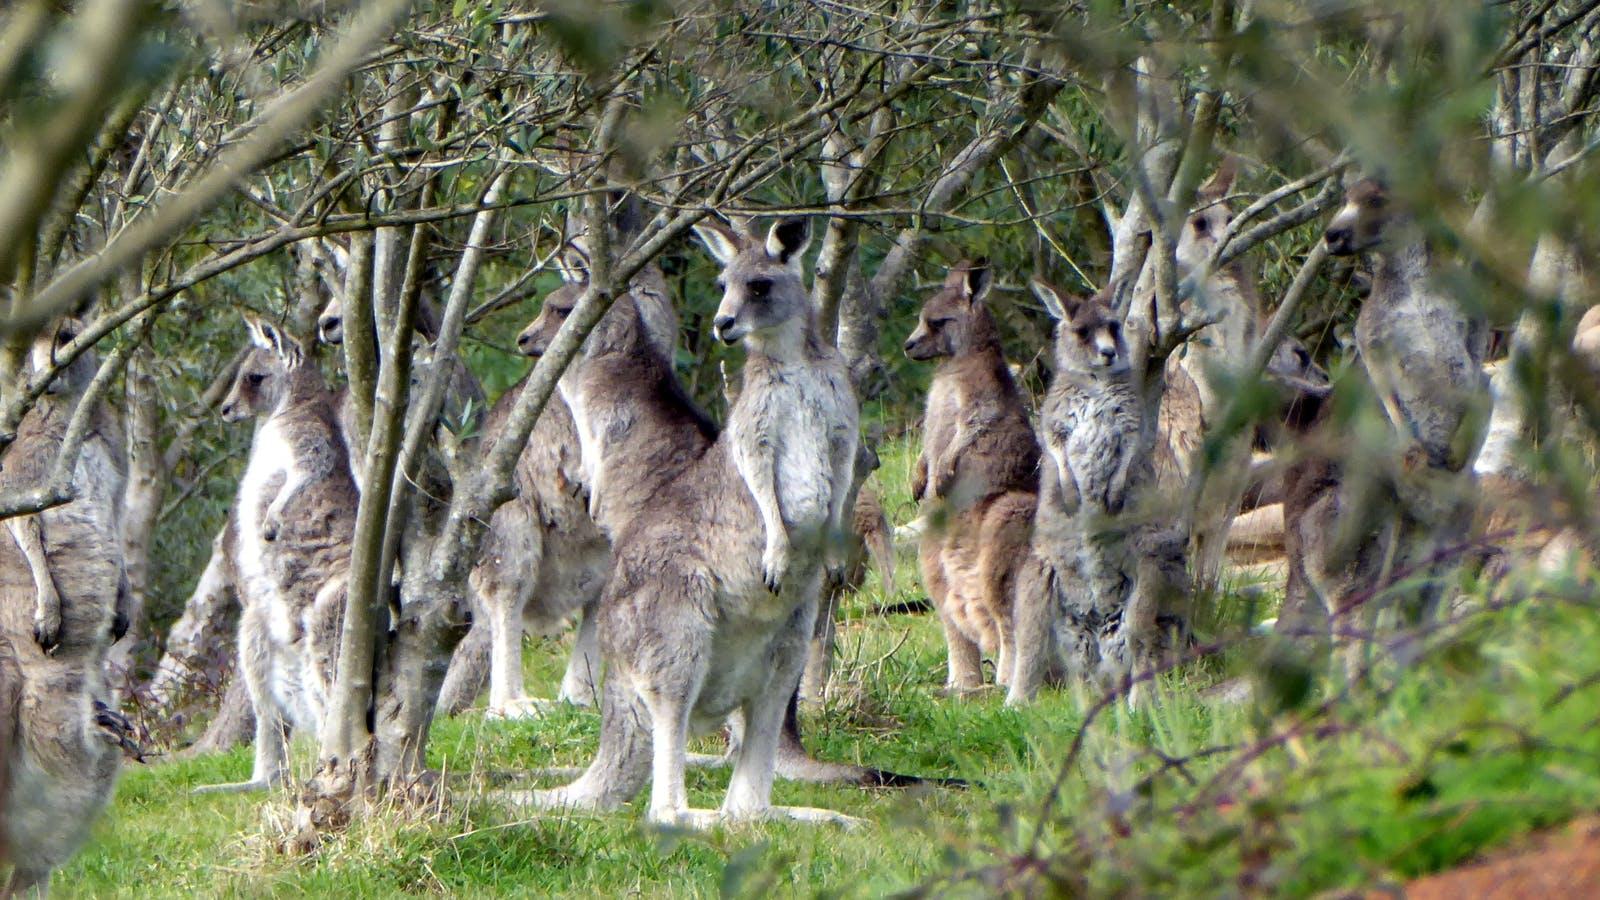 Kangaroos in the olive grove